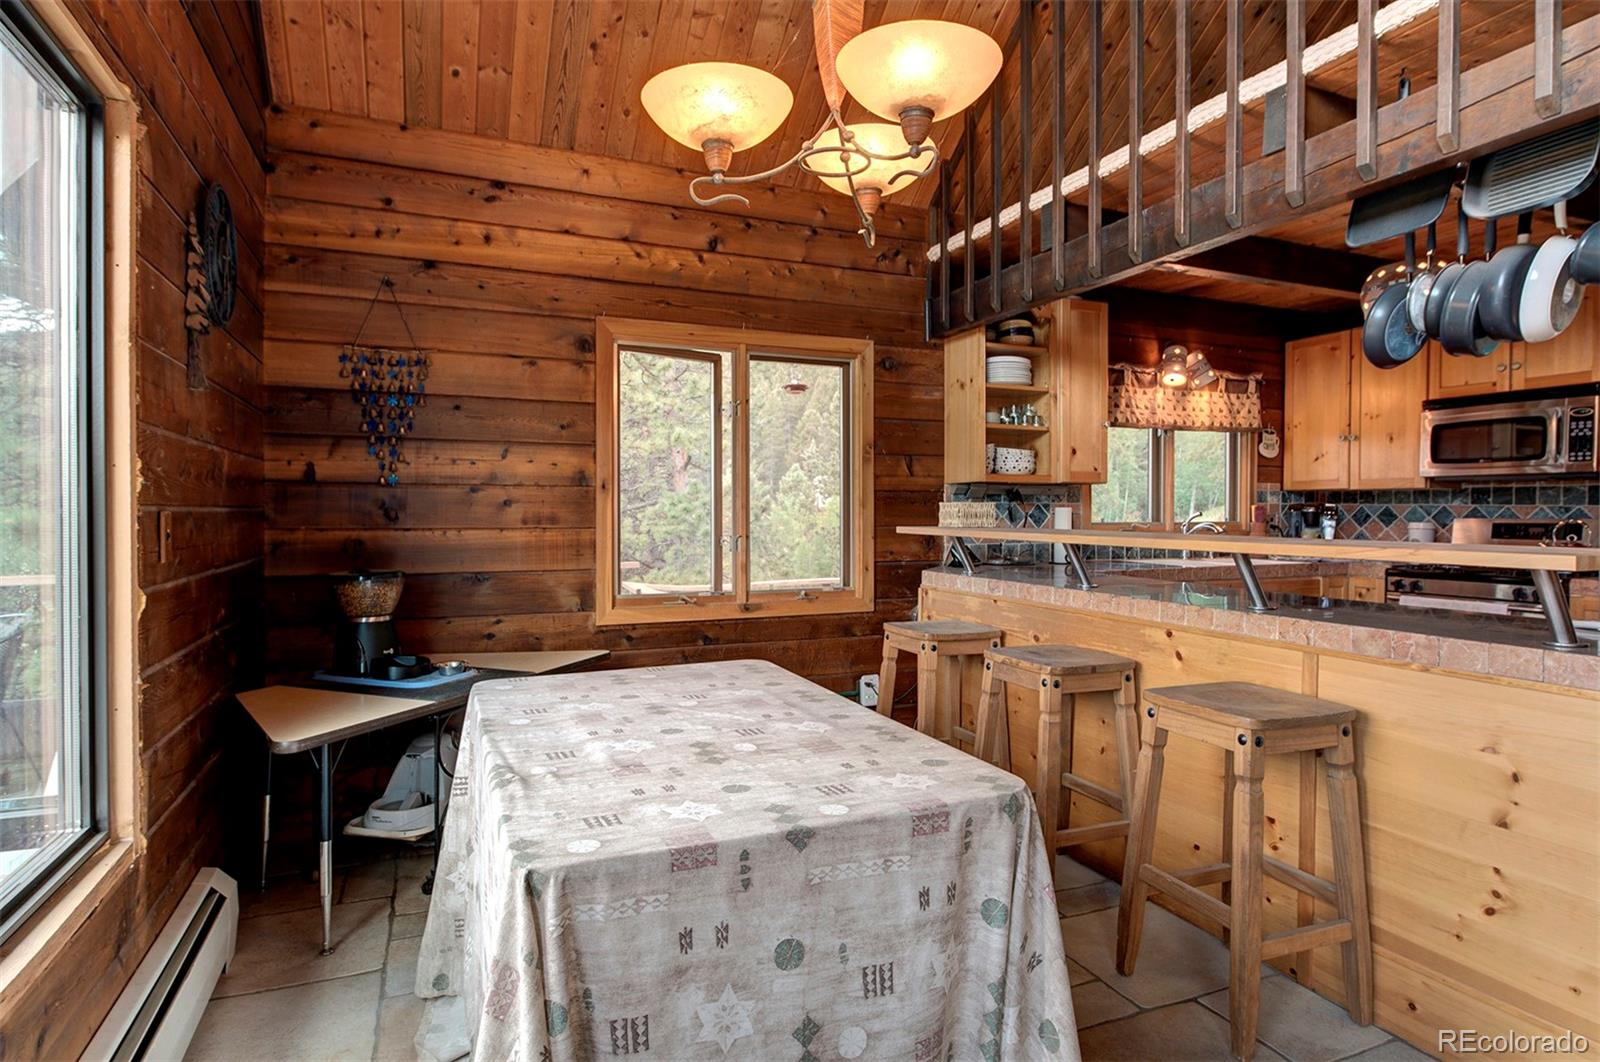 MLS# 6922377 - 12 - 12123 Geronimo Trail, Conifer, CO 80433